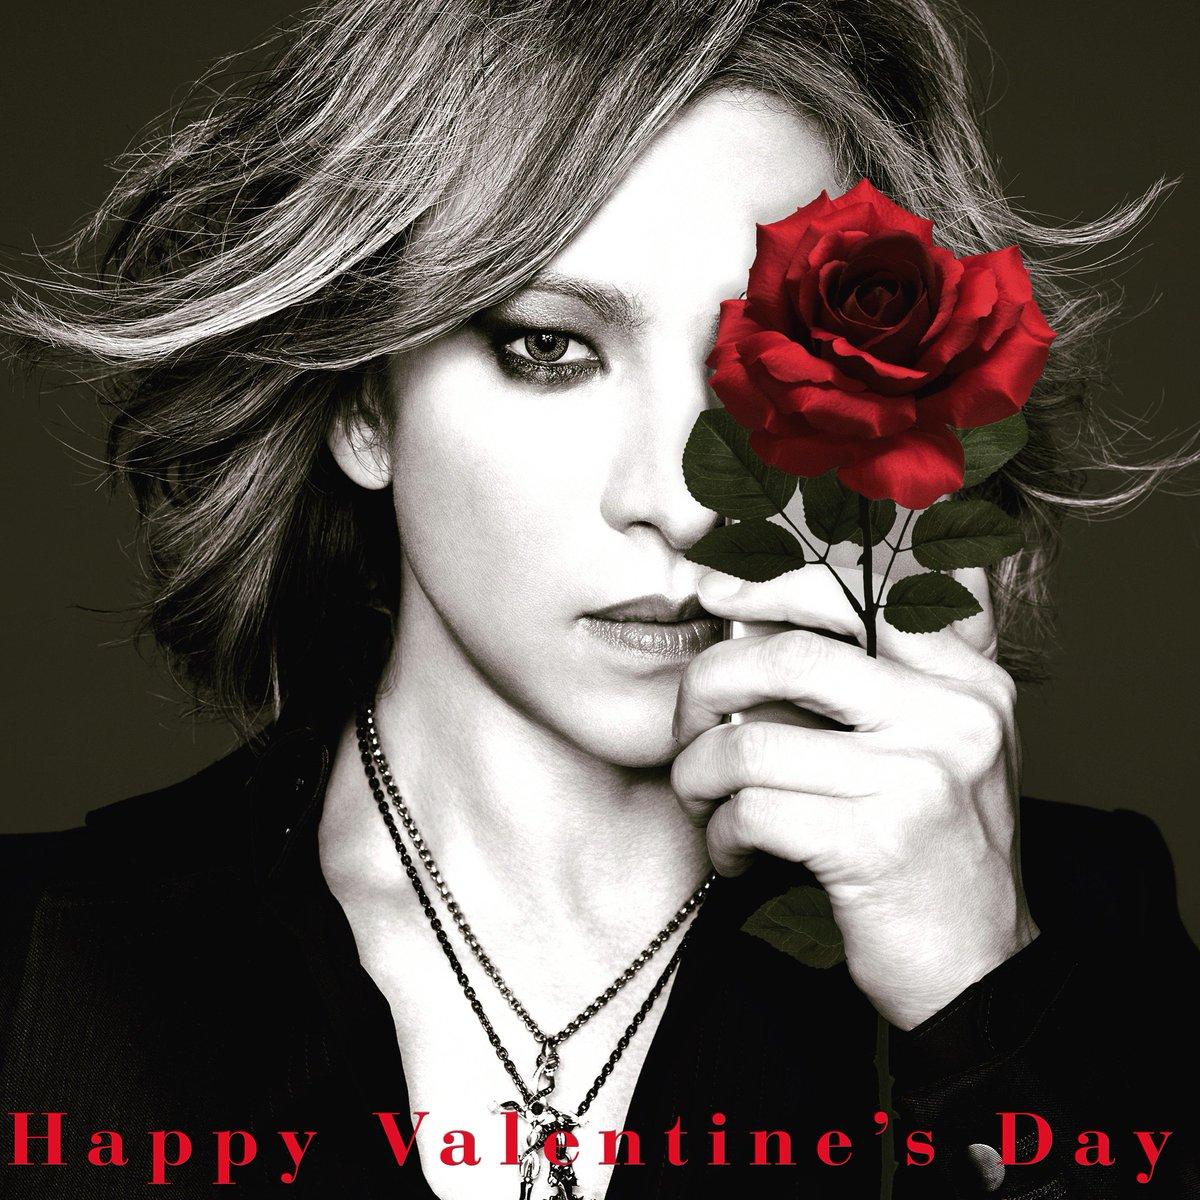 Hello from LA. Happy #ValentinesDay. #yoshiki #xjapan #fanmade #RoseOfPain #BloodRedRoses ちなみに #日本とアメリカのバレンタインは逆。。 #男性から女性へプレゼントを贈る!   https://t.co/7F65CSBA0F